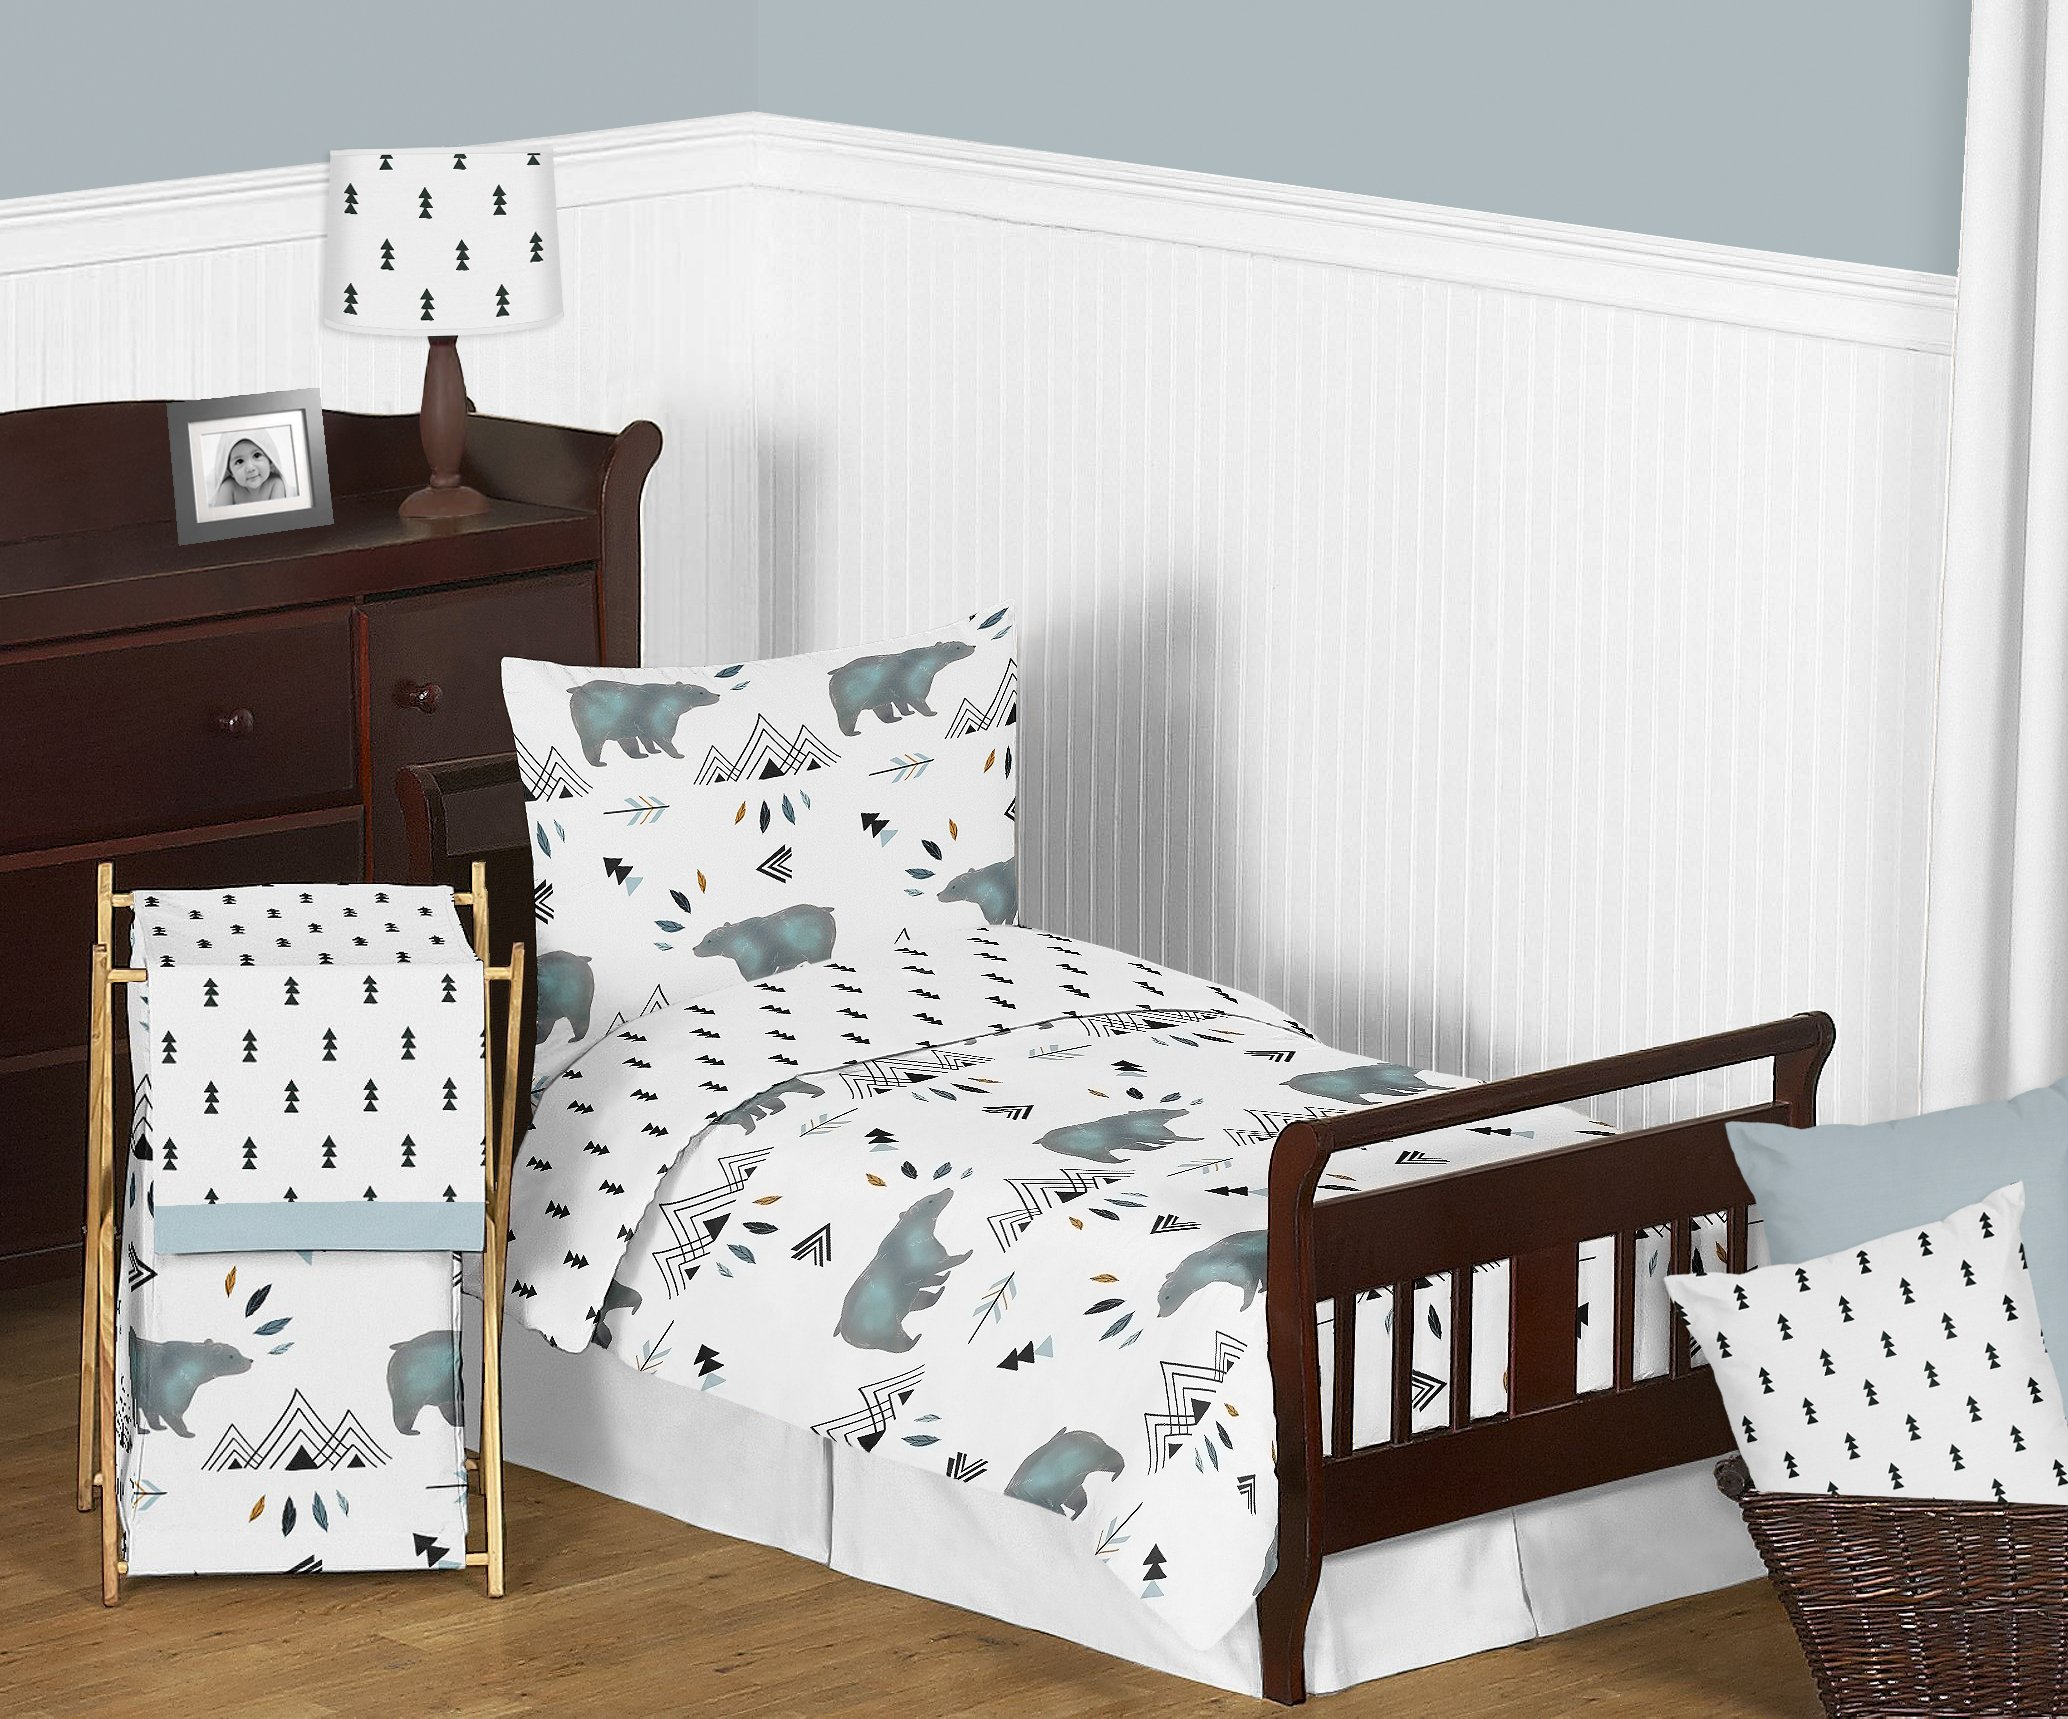 Sweet Jojo Designs 5-Piece Bear Mountain Watercolor Boy Toddler Kid Childrens Bedding Set s Comforter, Sham and Sheets